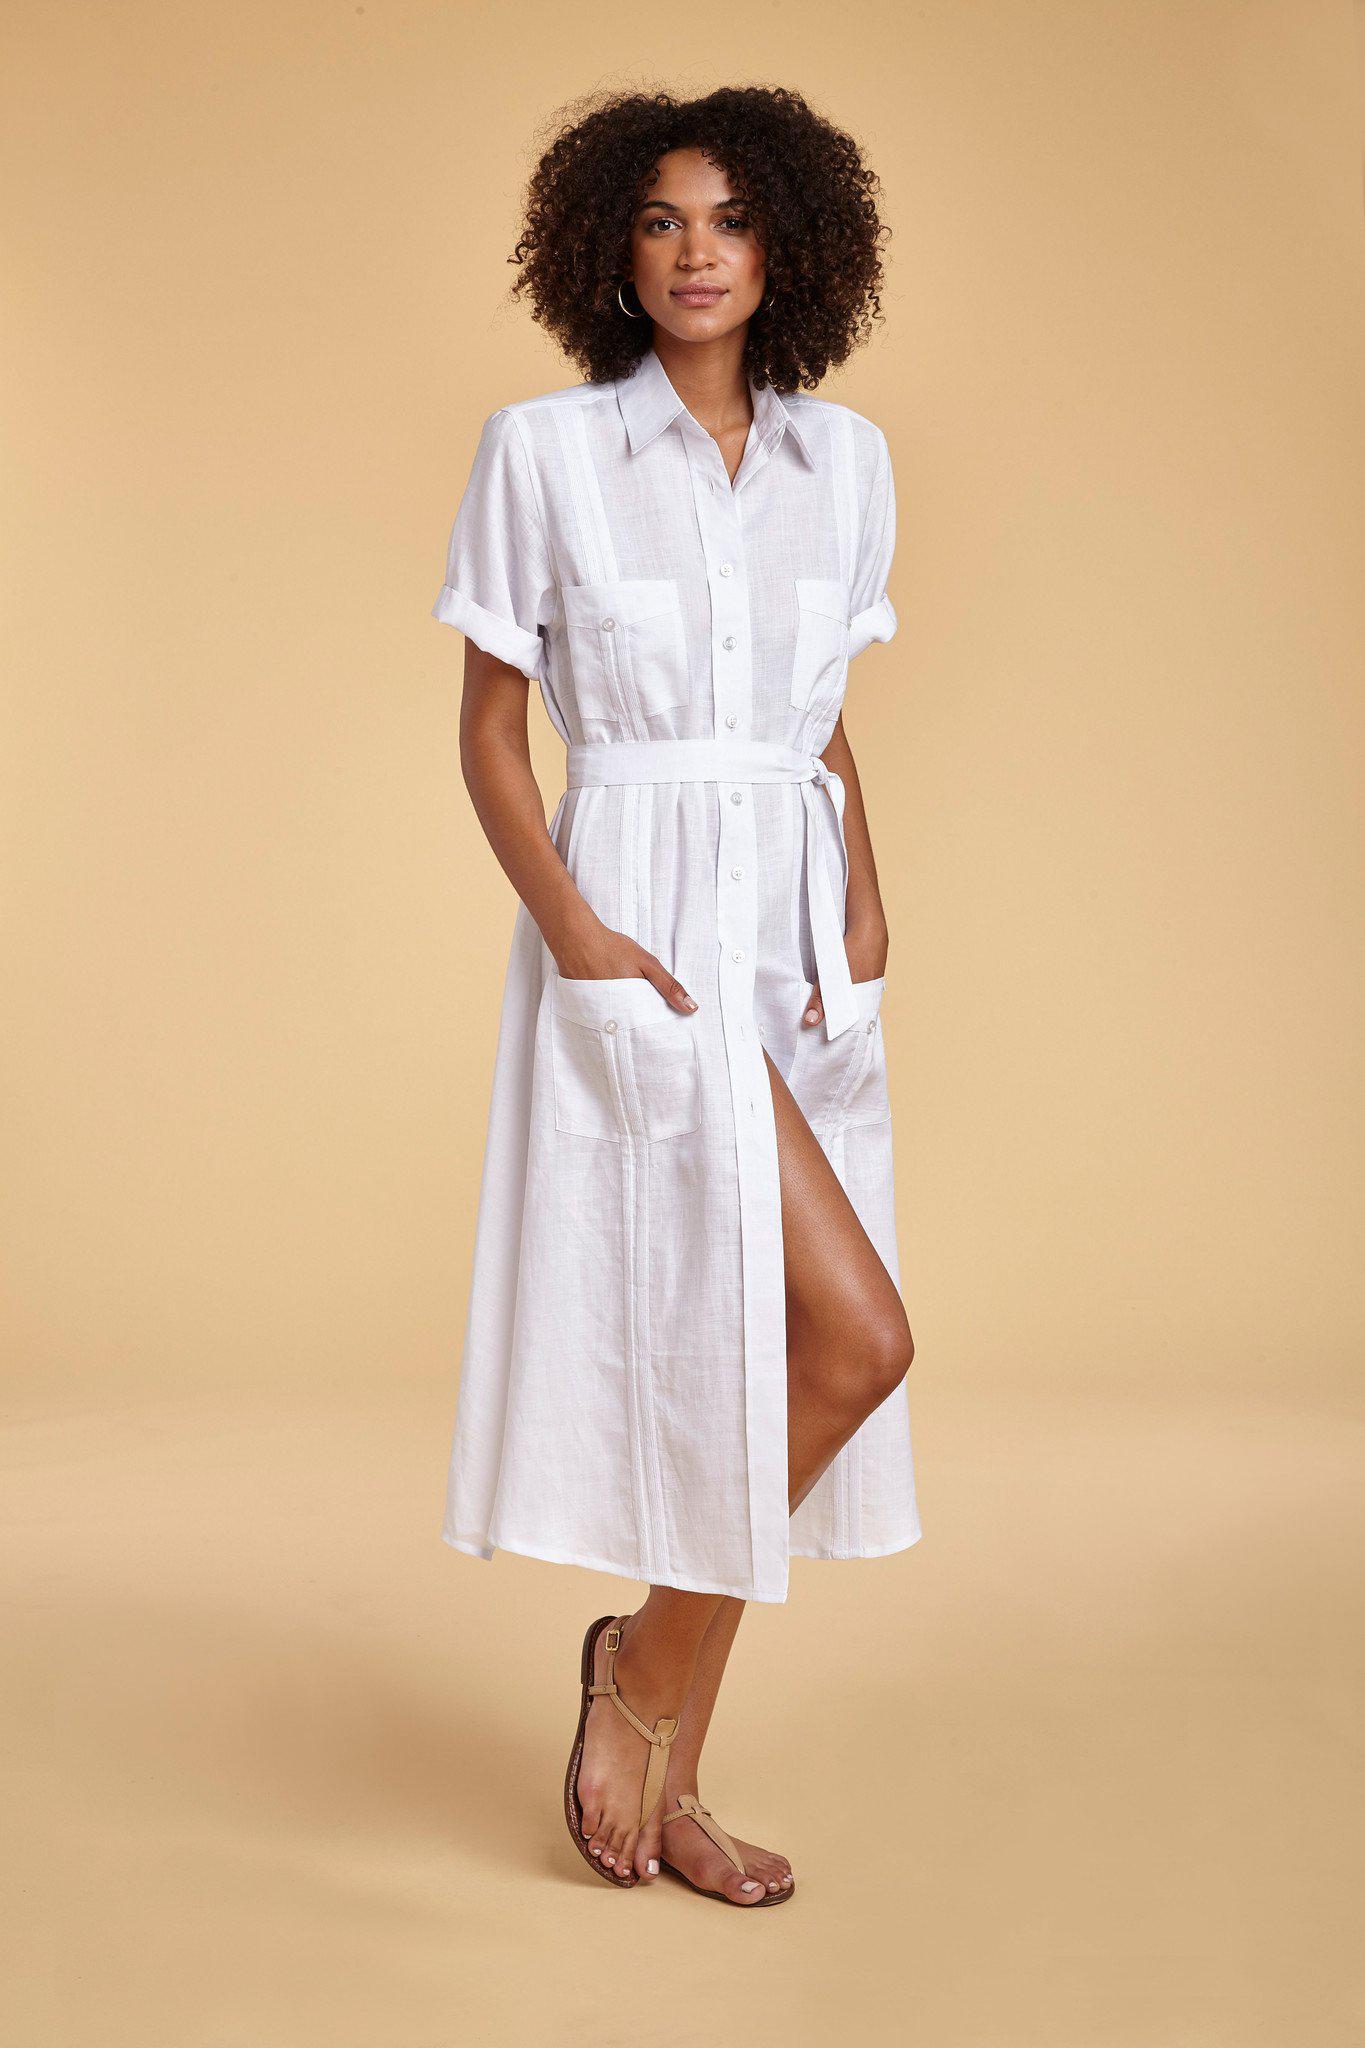 ca83311fc8 Lyst - Miguelina Guayabera Soft Linen Shirt-dress in Blue